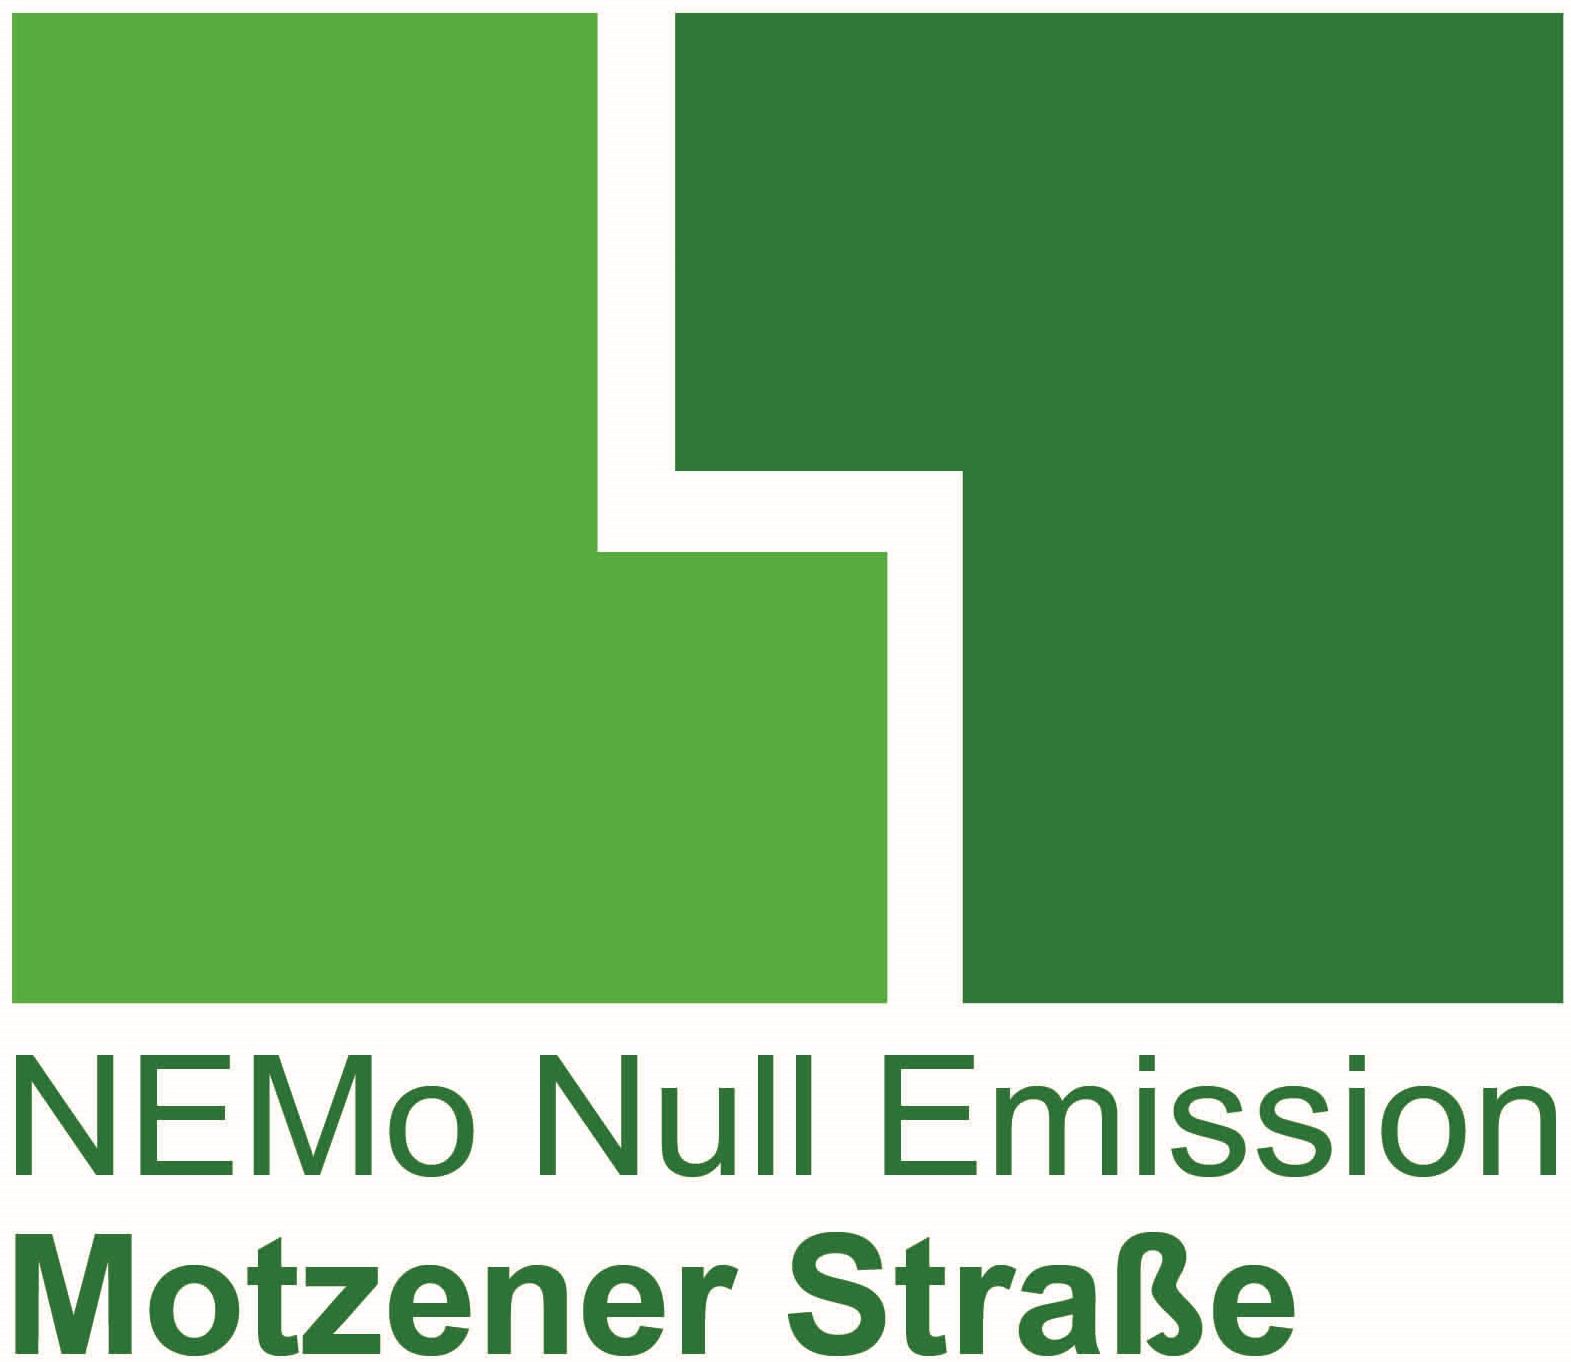 NEMO Null Emission Motzener Straße grünes Logo